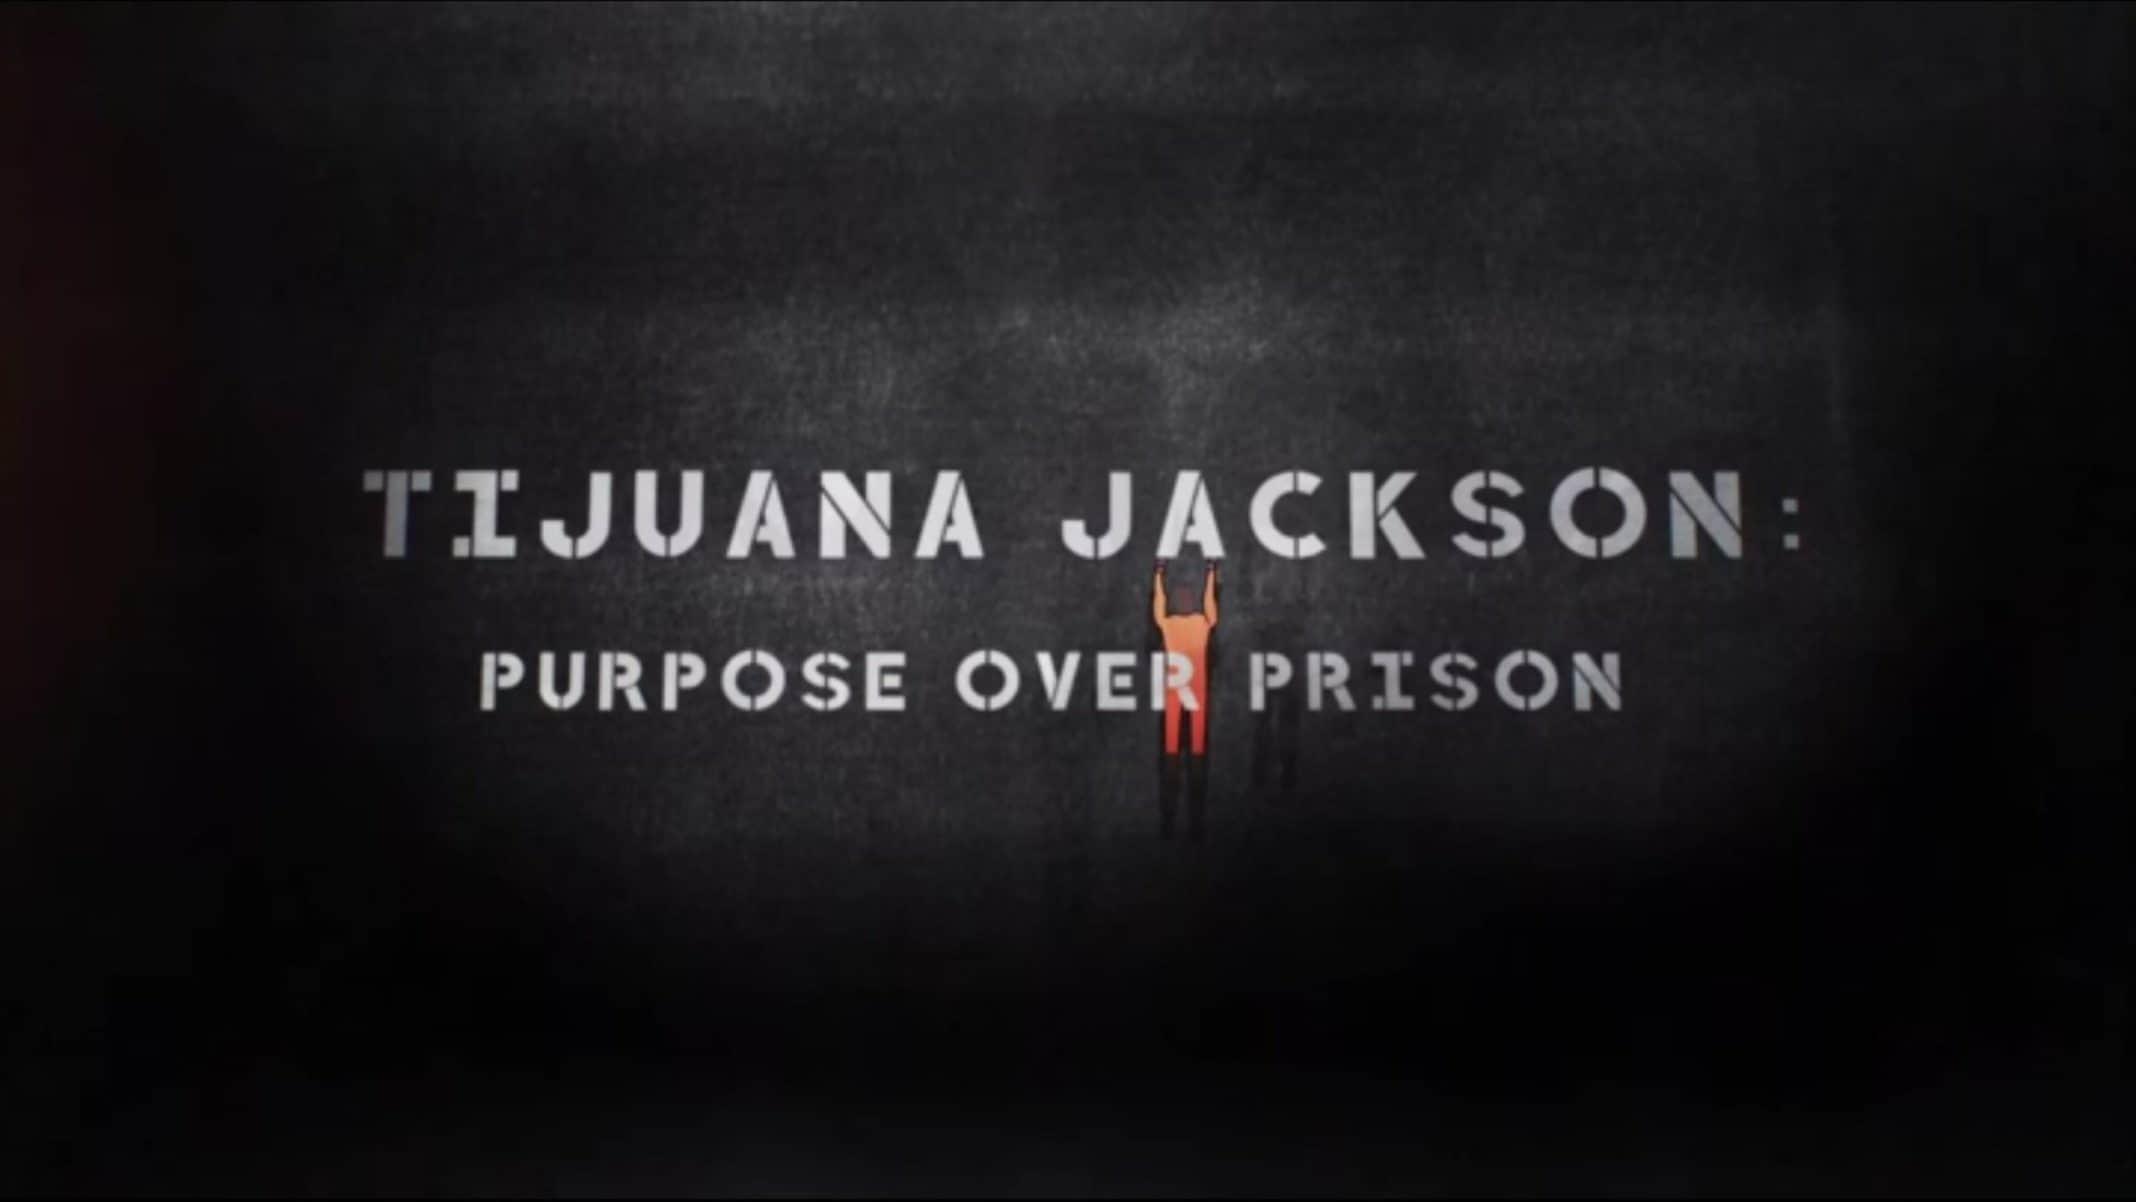 Title Card - Tijuana Jackson Purpose Over Prison